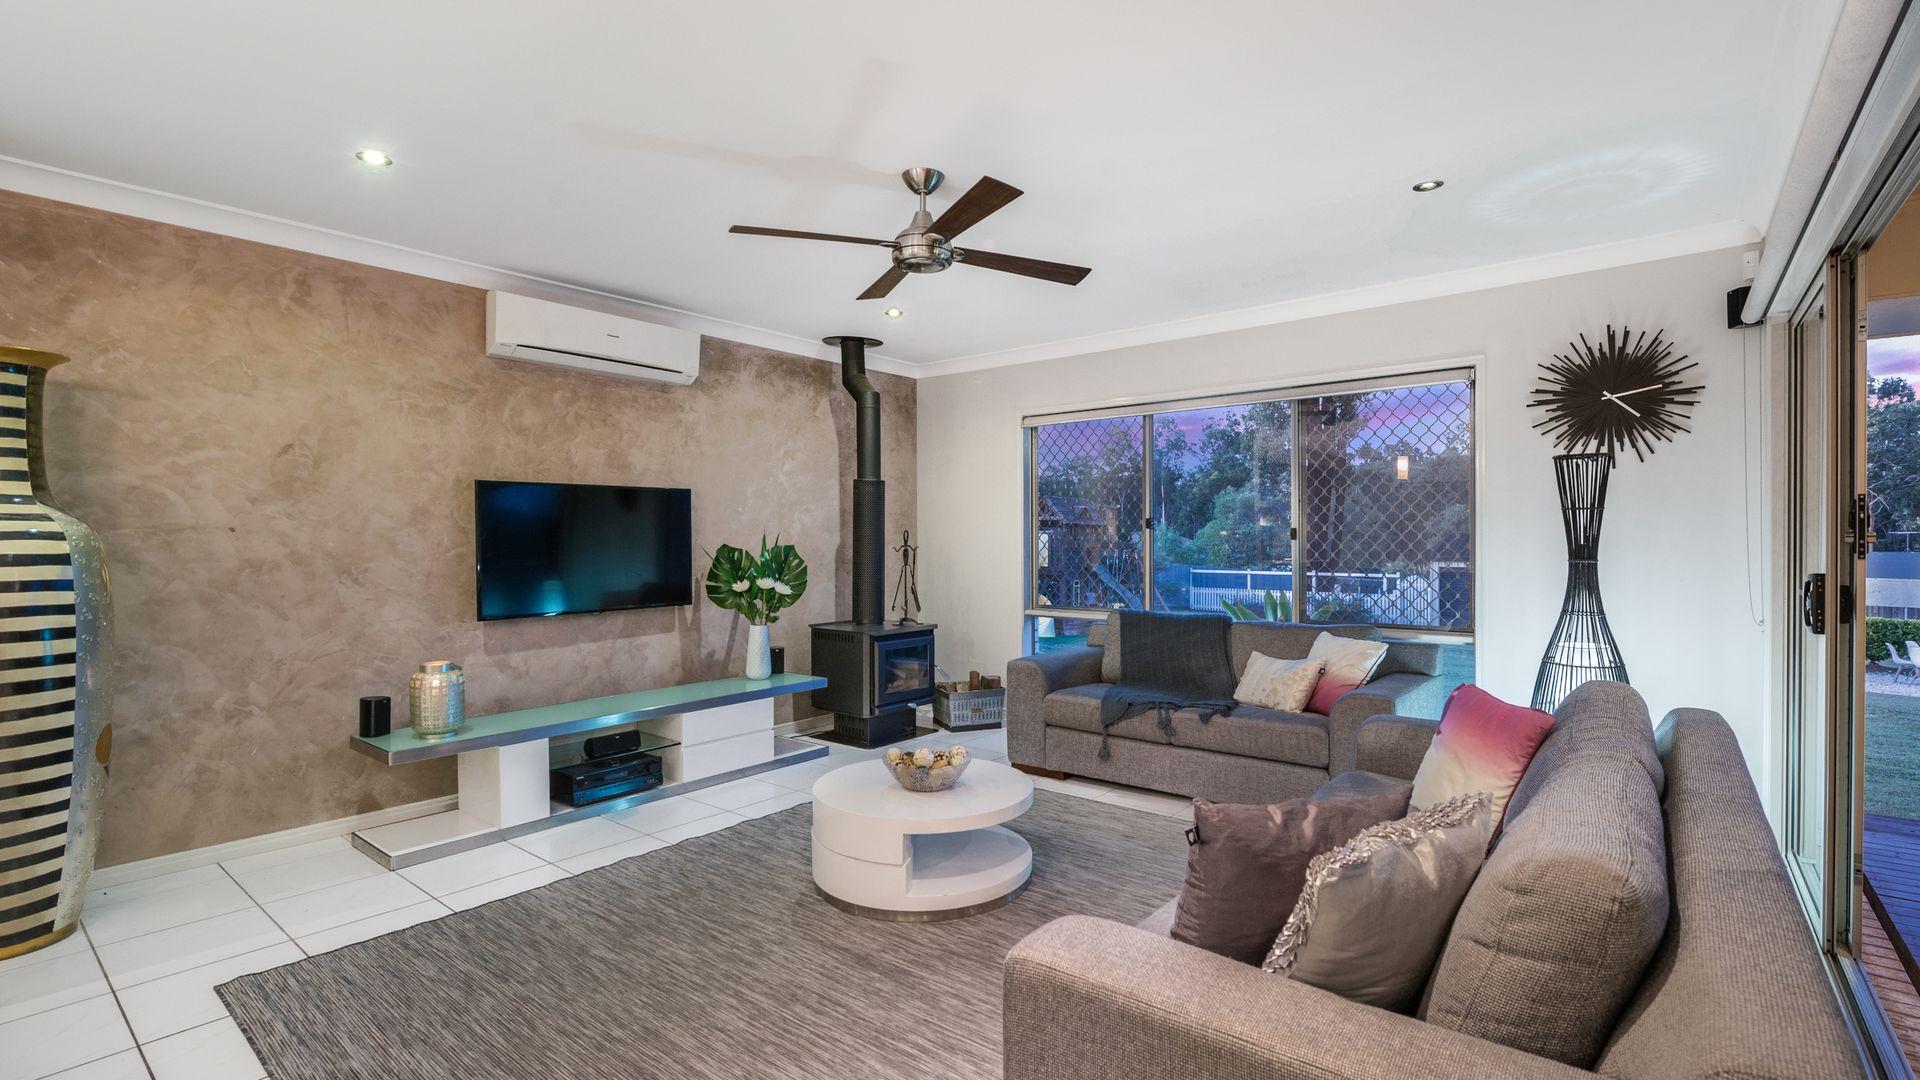 22-32 Bluewing Court, Greenbank QLD 4124, Image 2